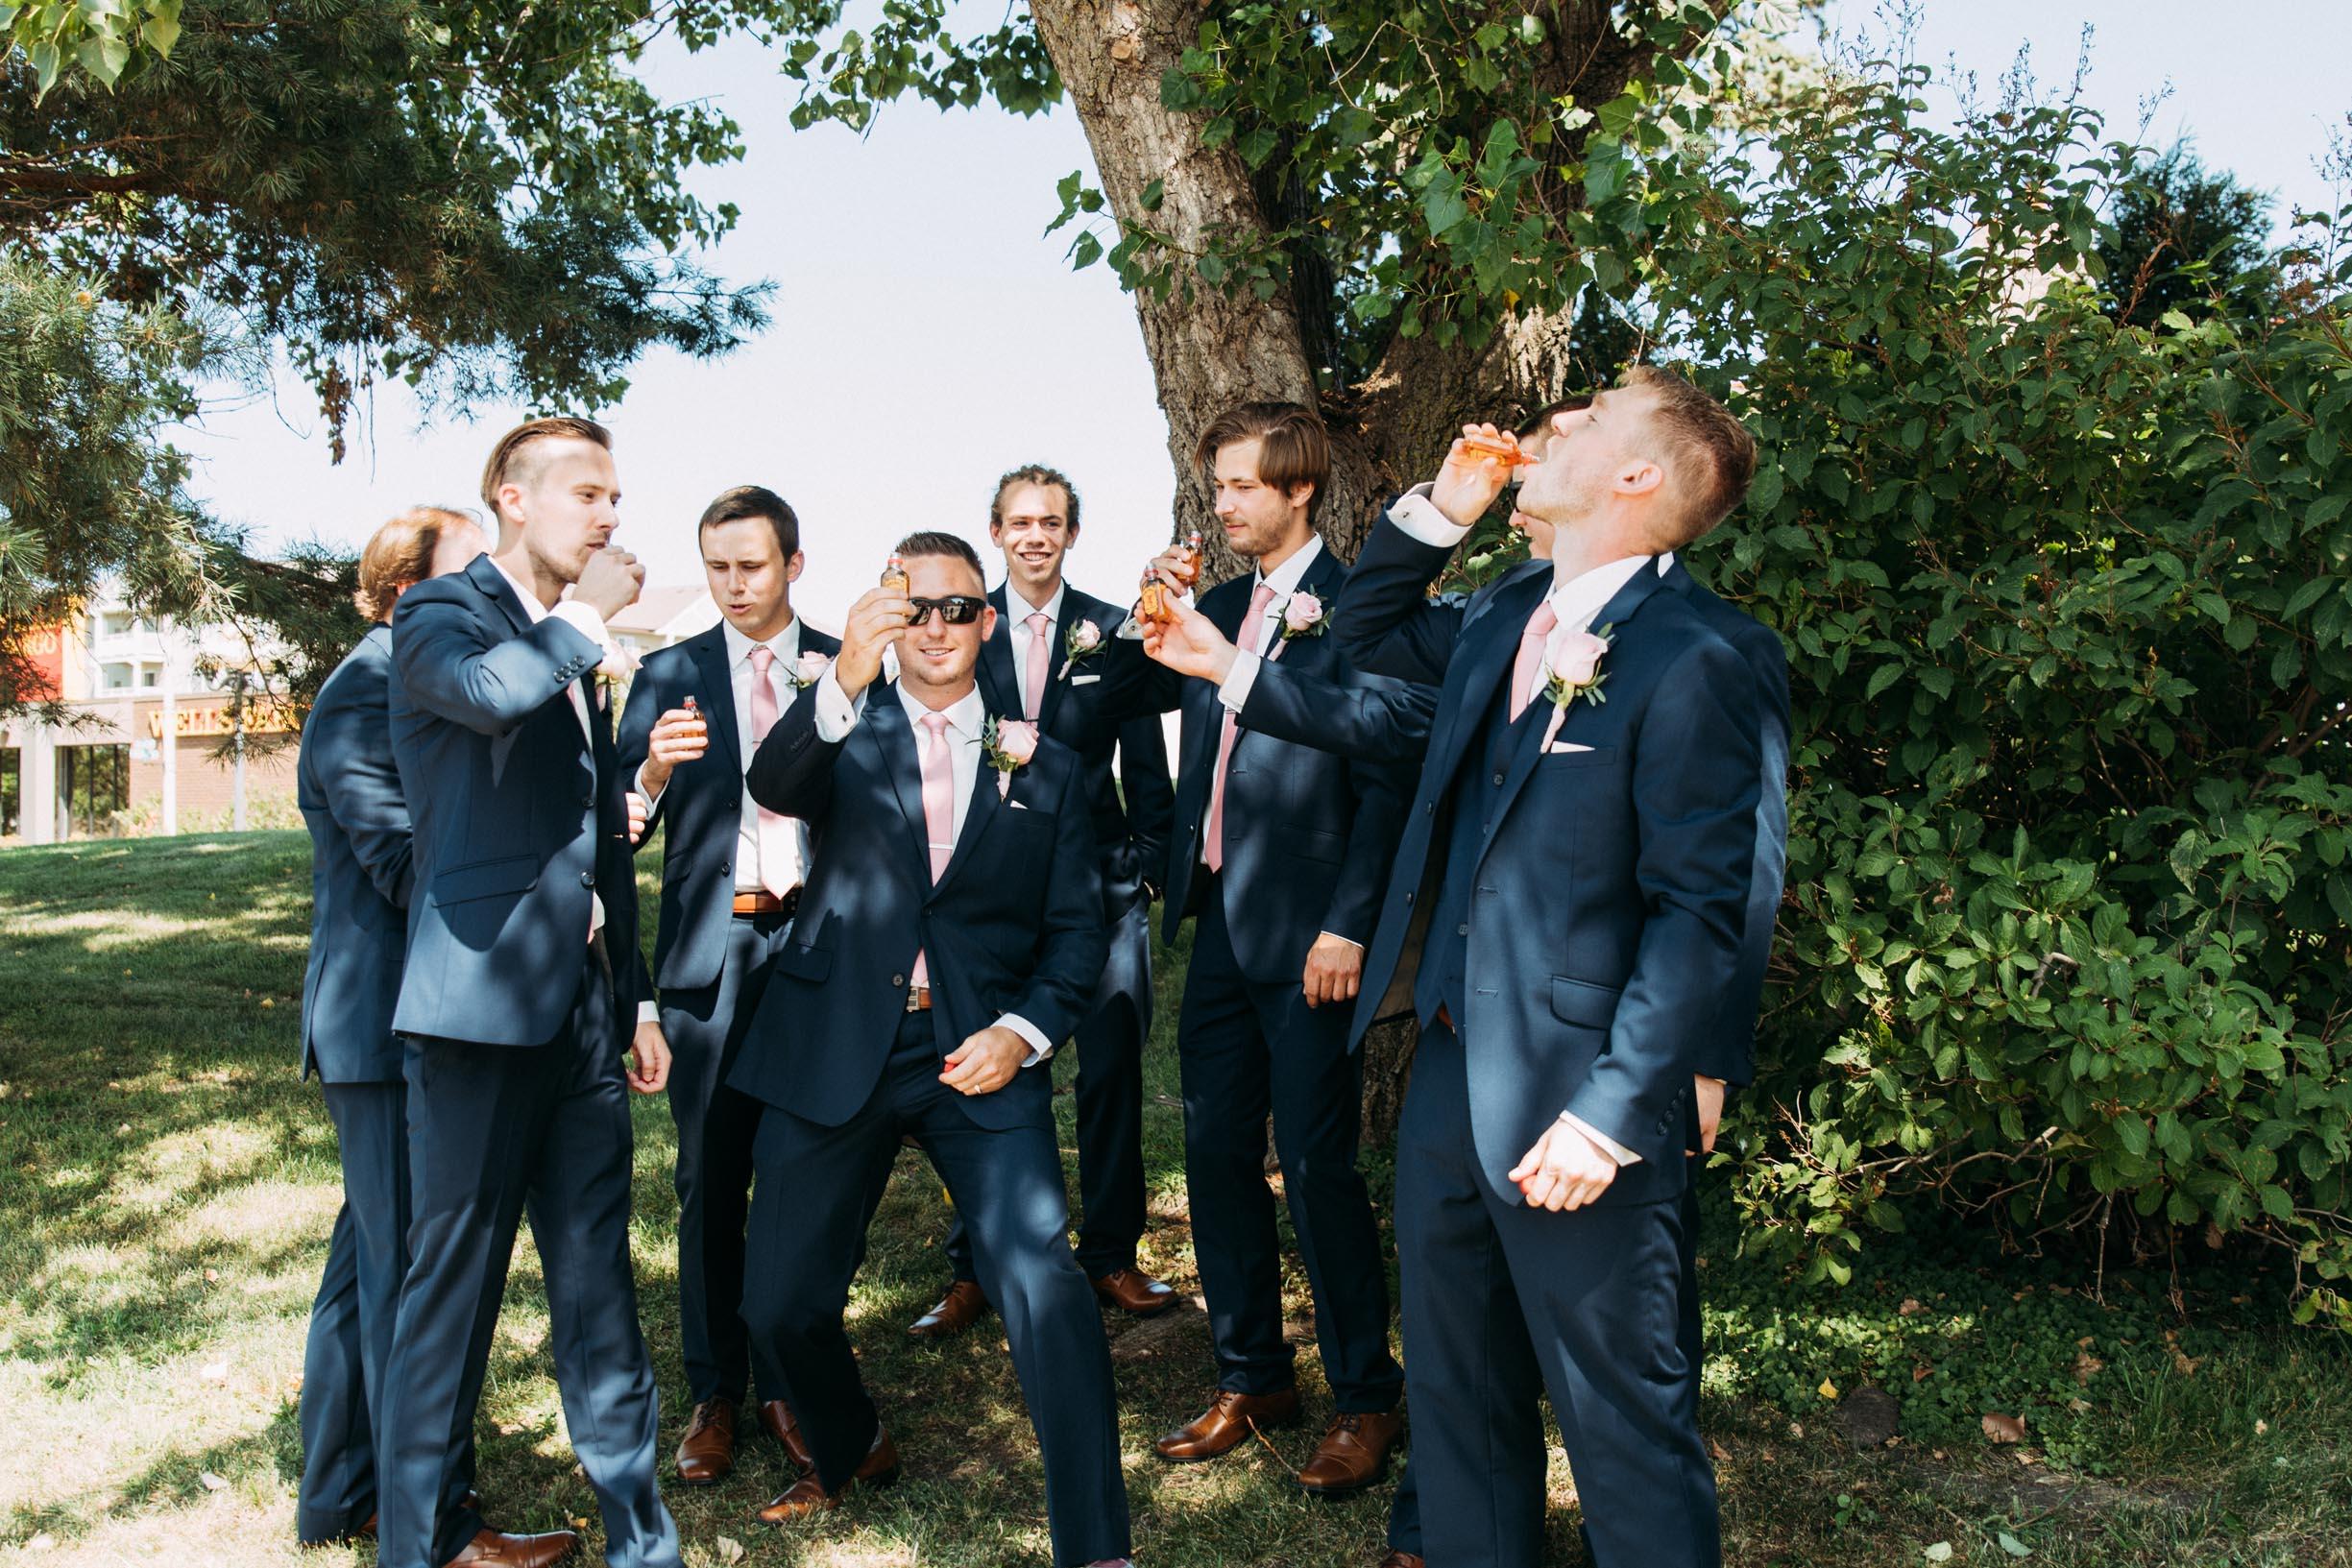 36-WeddingsattheBroz_Minnesota_WeddingBlog_WeddingParty.jpg